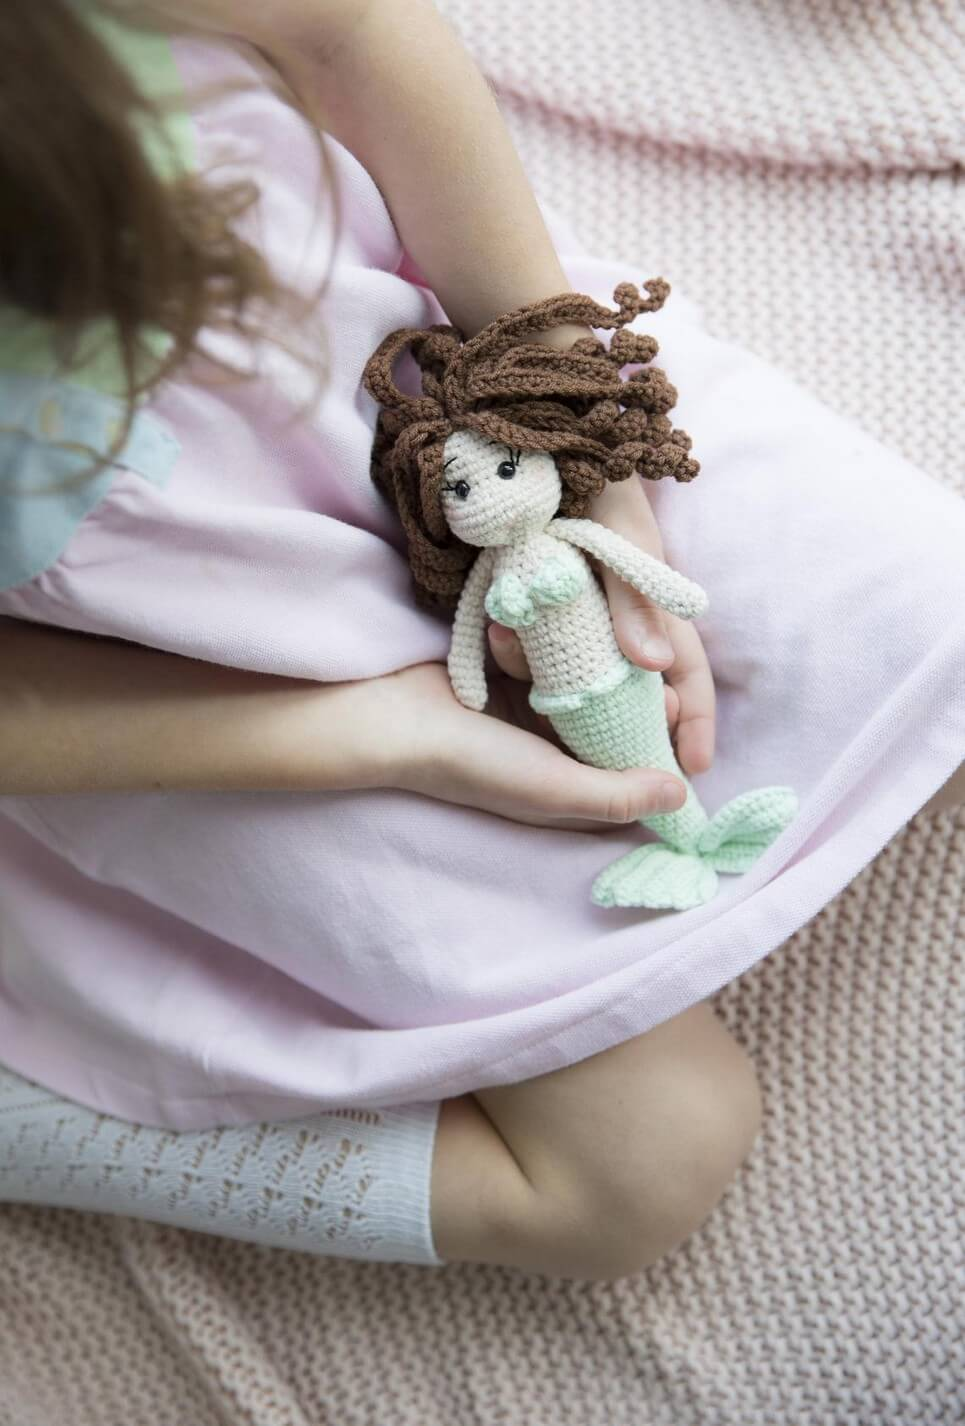 Little Mermaid Curly Hair Doll